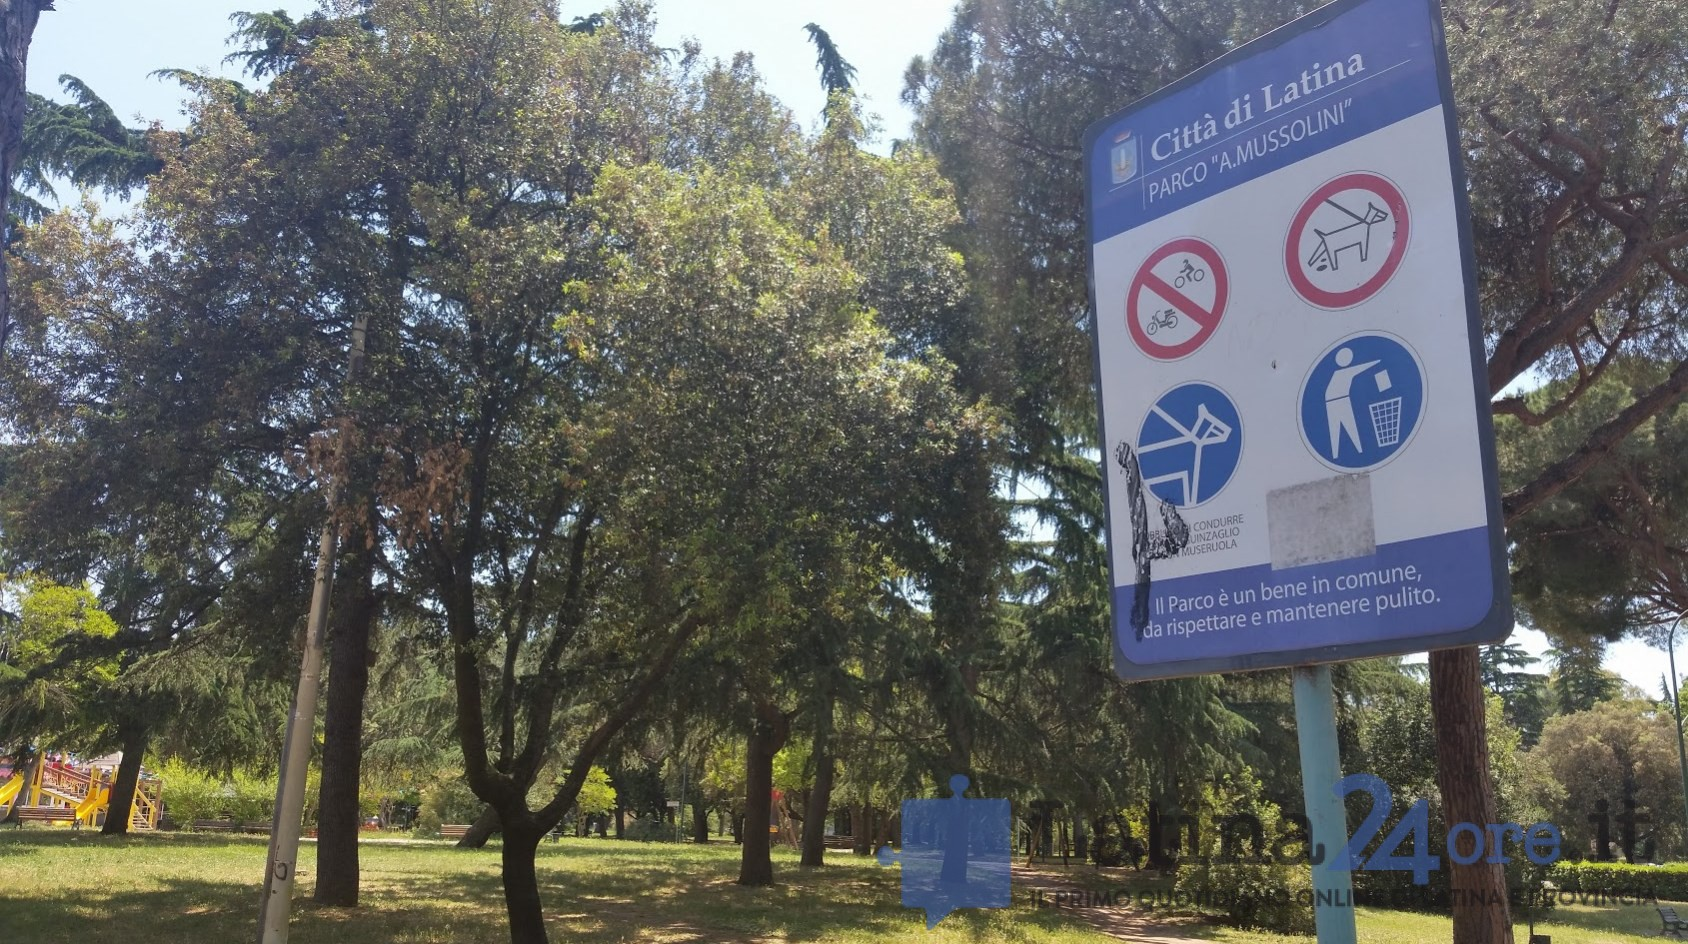 latina parco mussolini speeches - photo#9